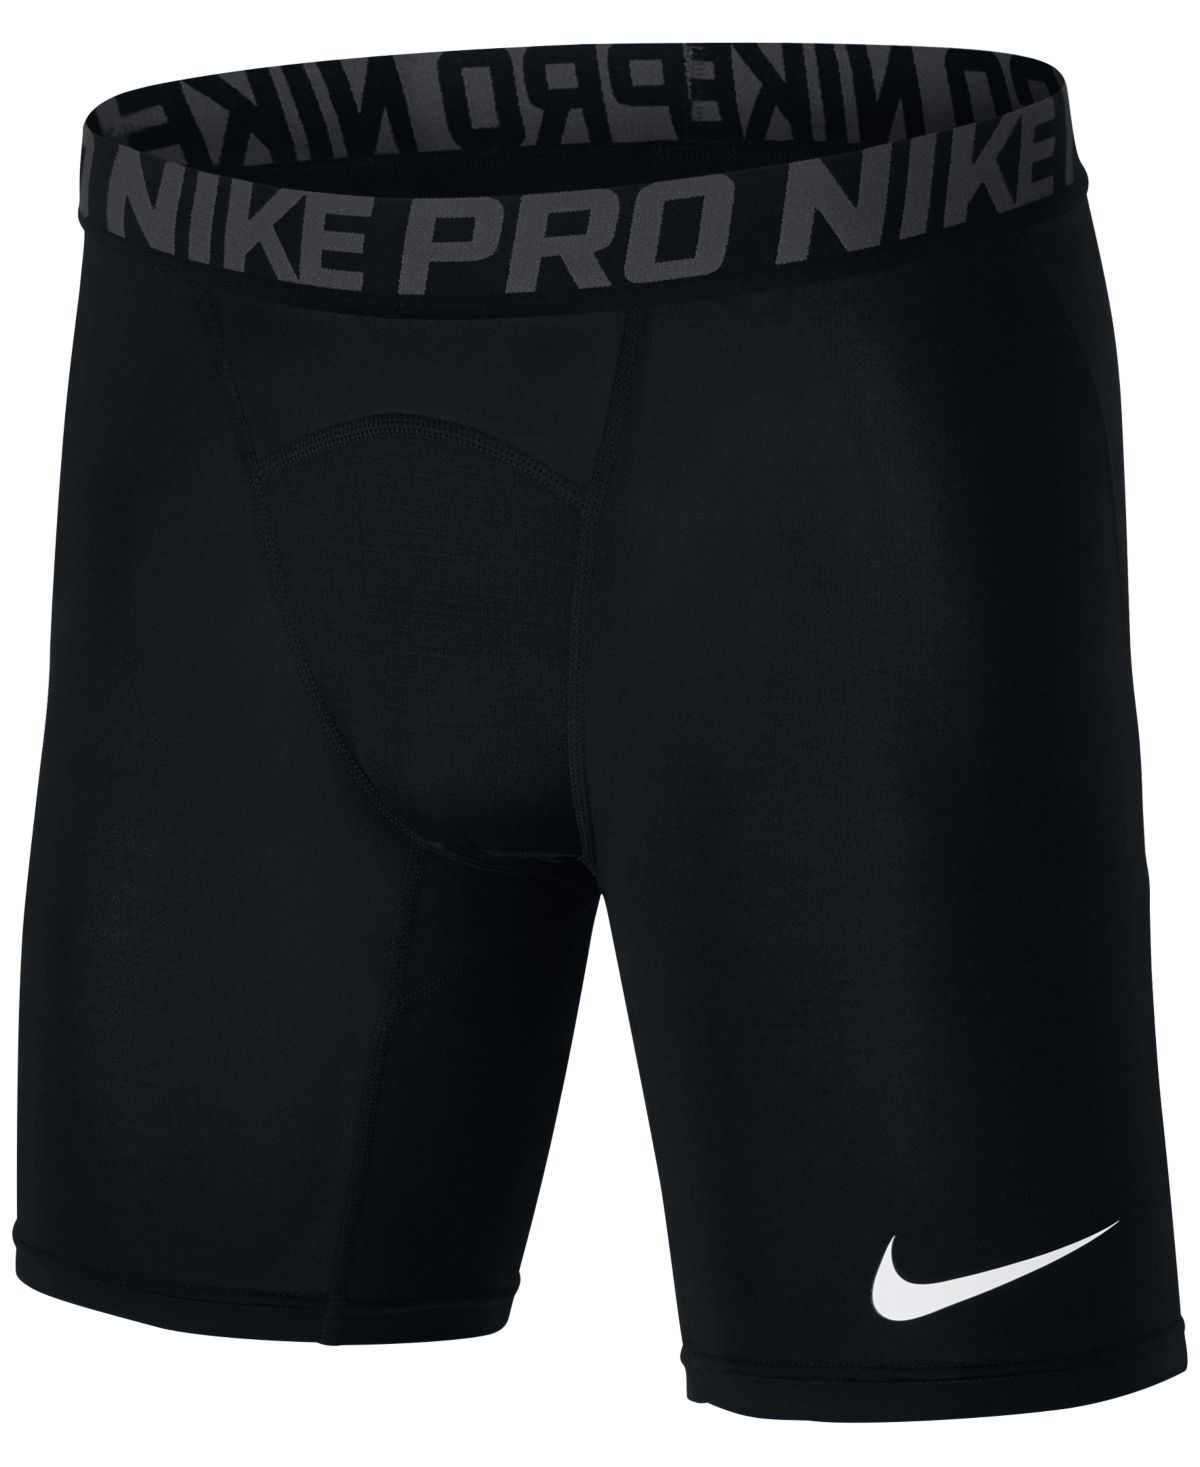 Nike Men's Pro Drifit Compression Shorts Black (With